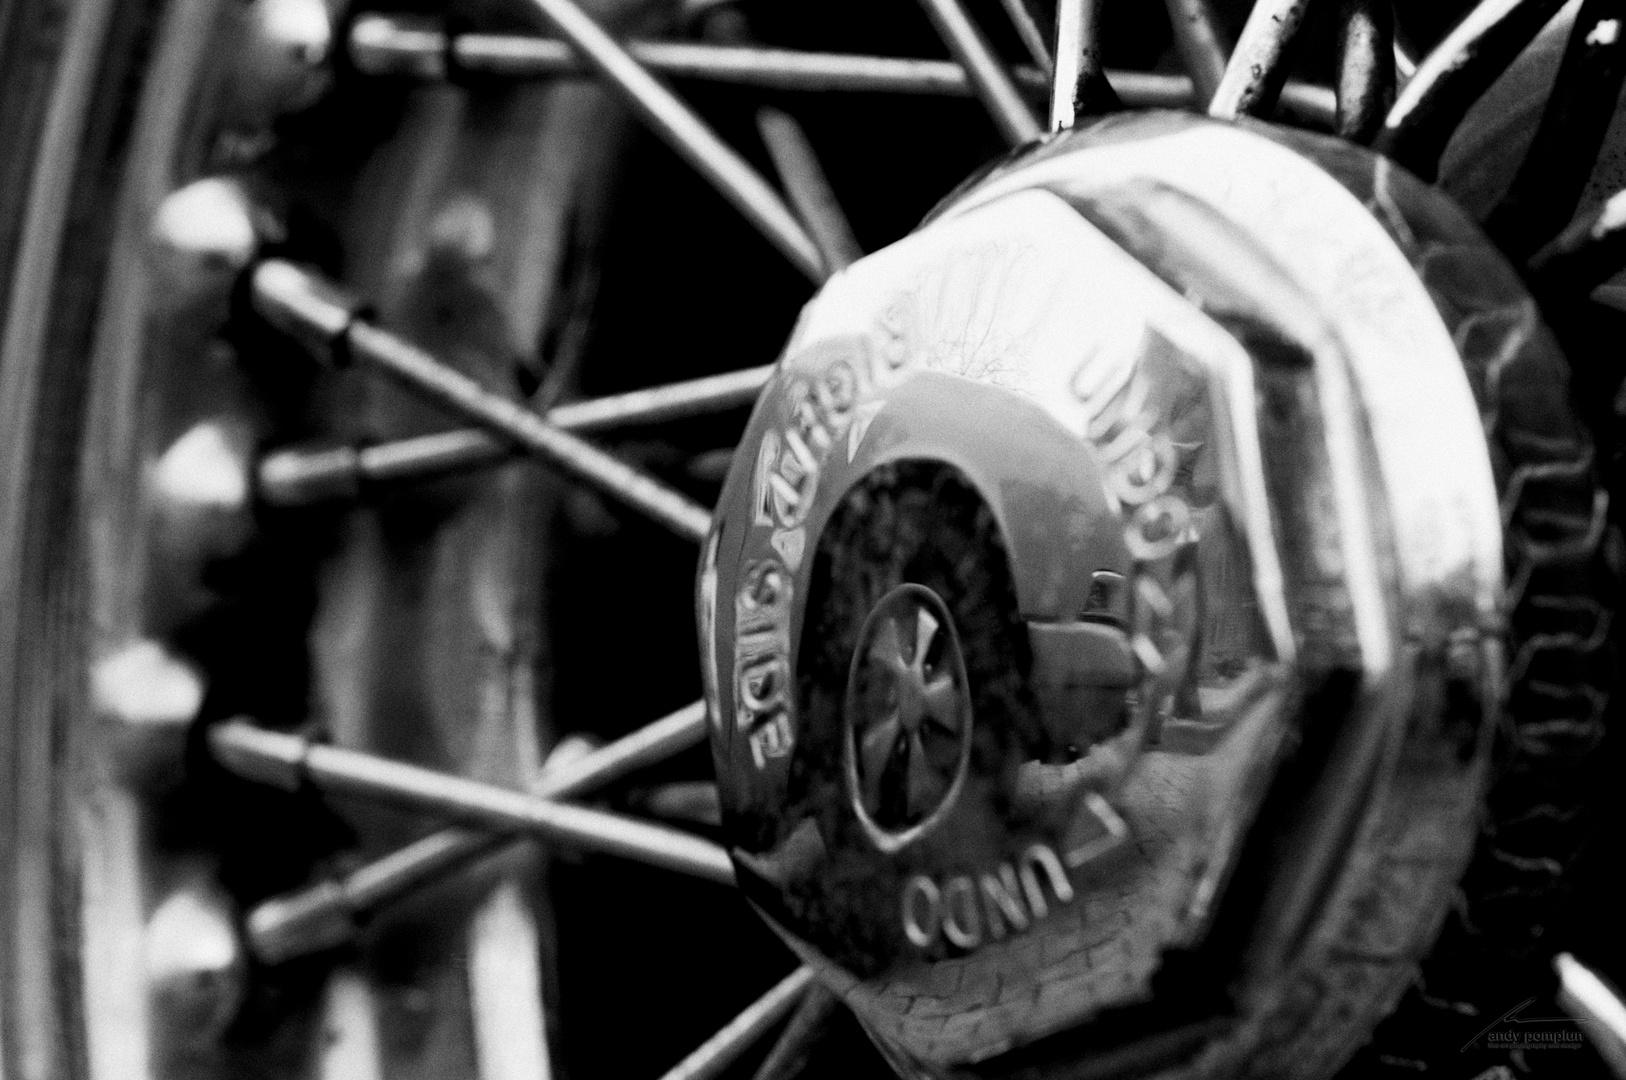 spokes&wheels